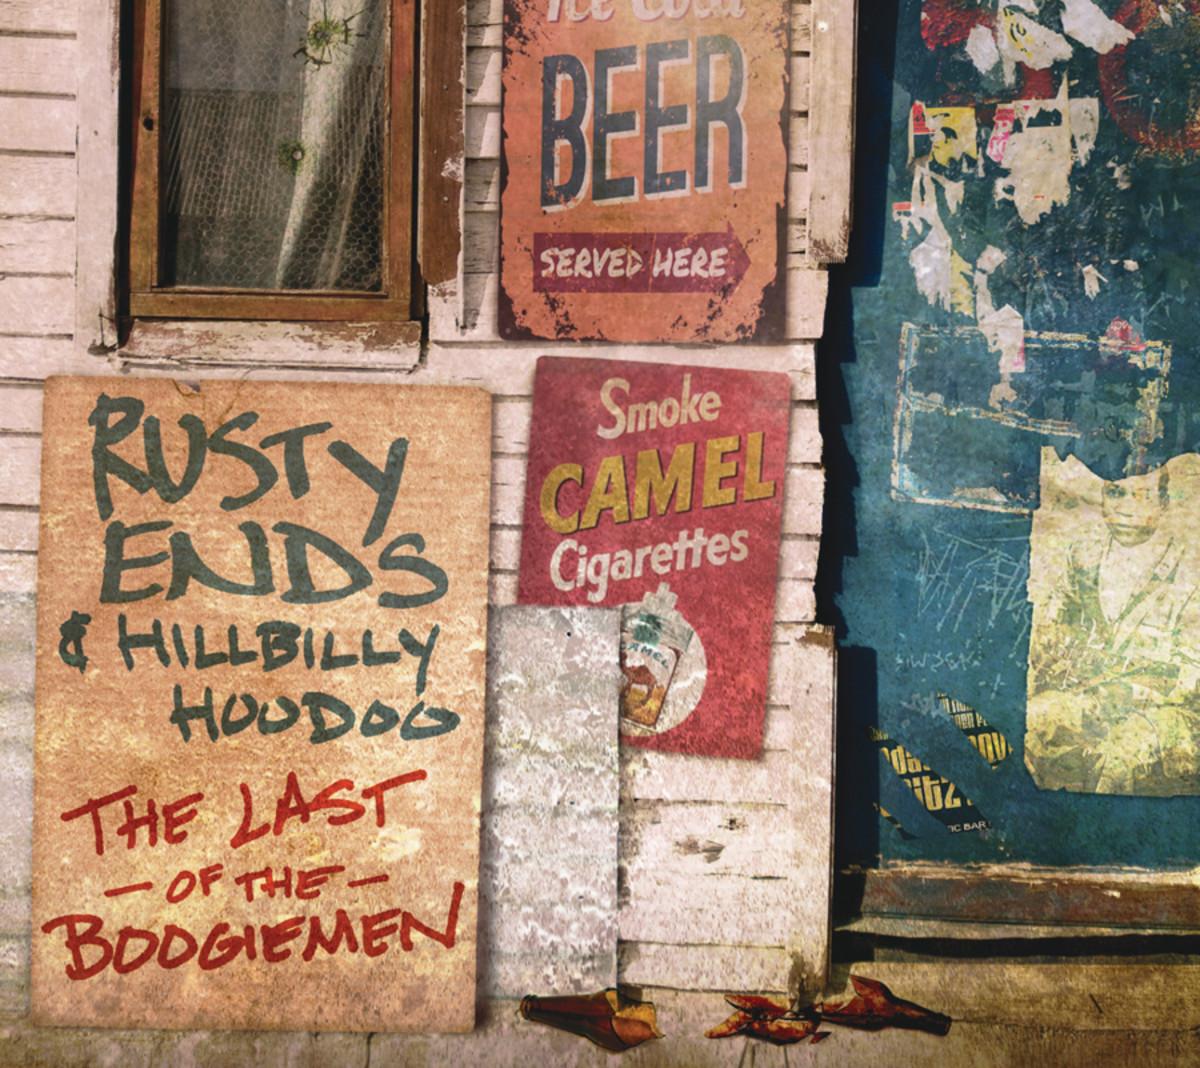 RustyEnds.Cover